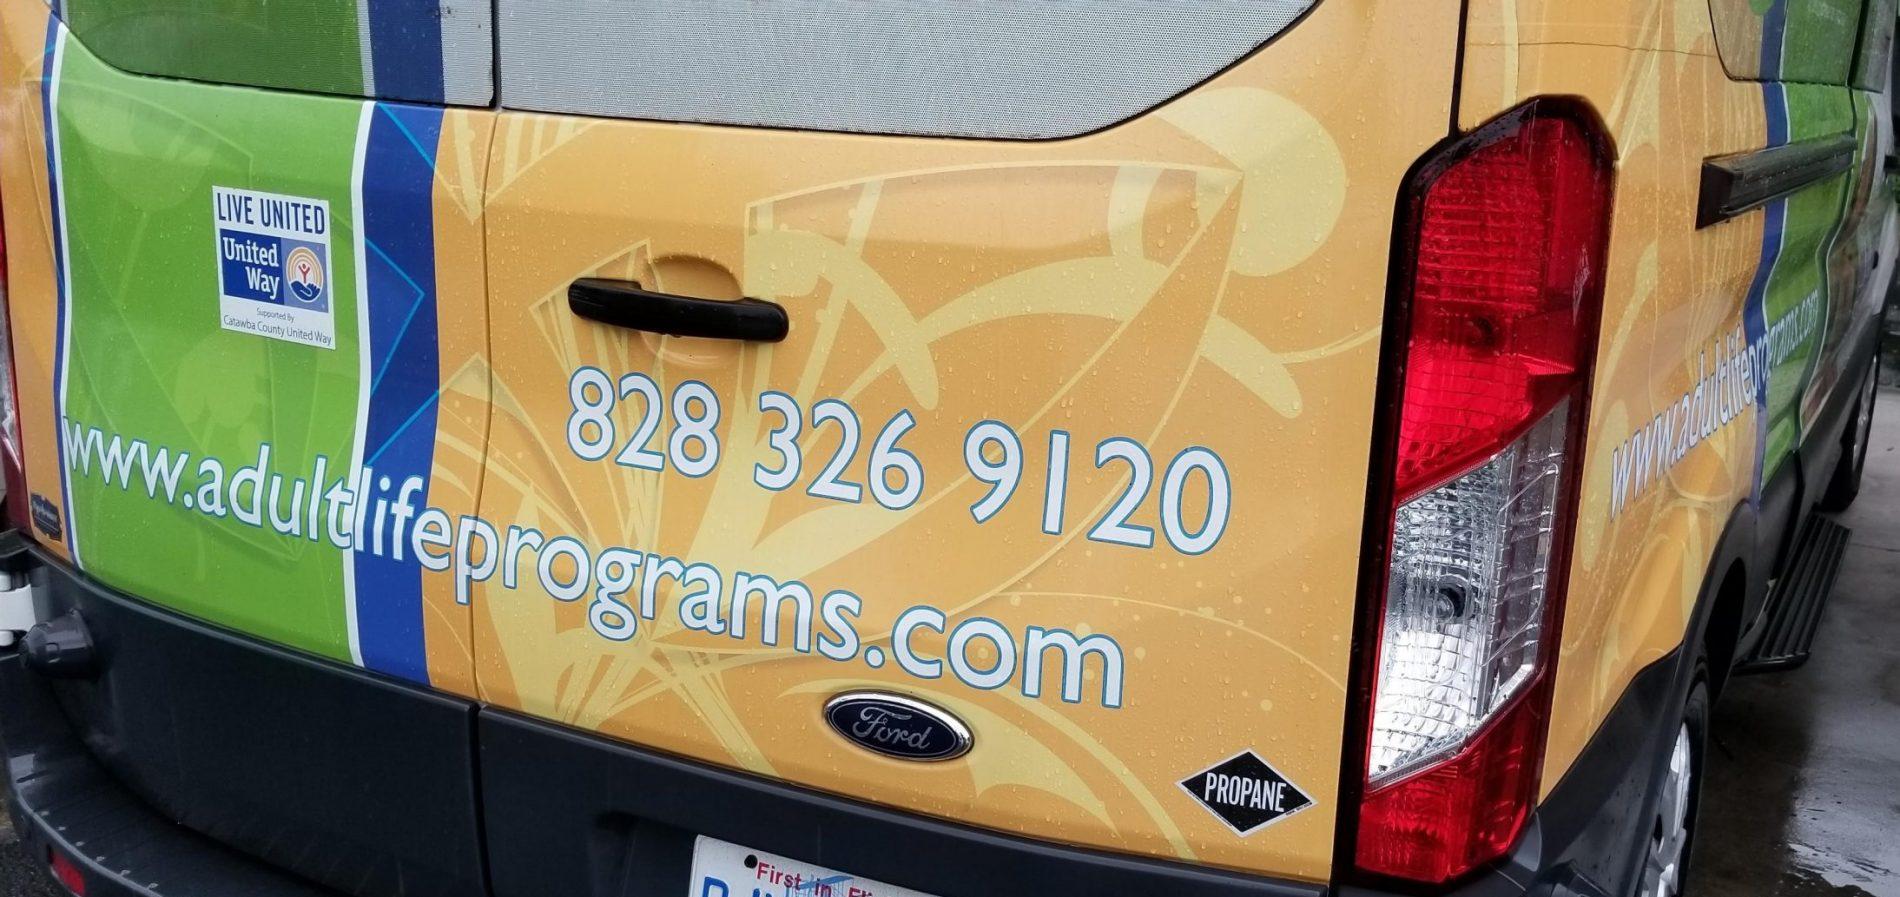 Propane Autogas Adult Life Program Vehicle